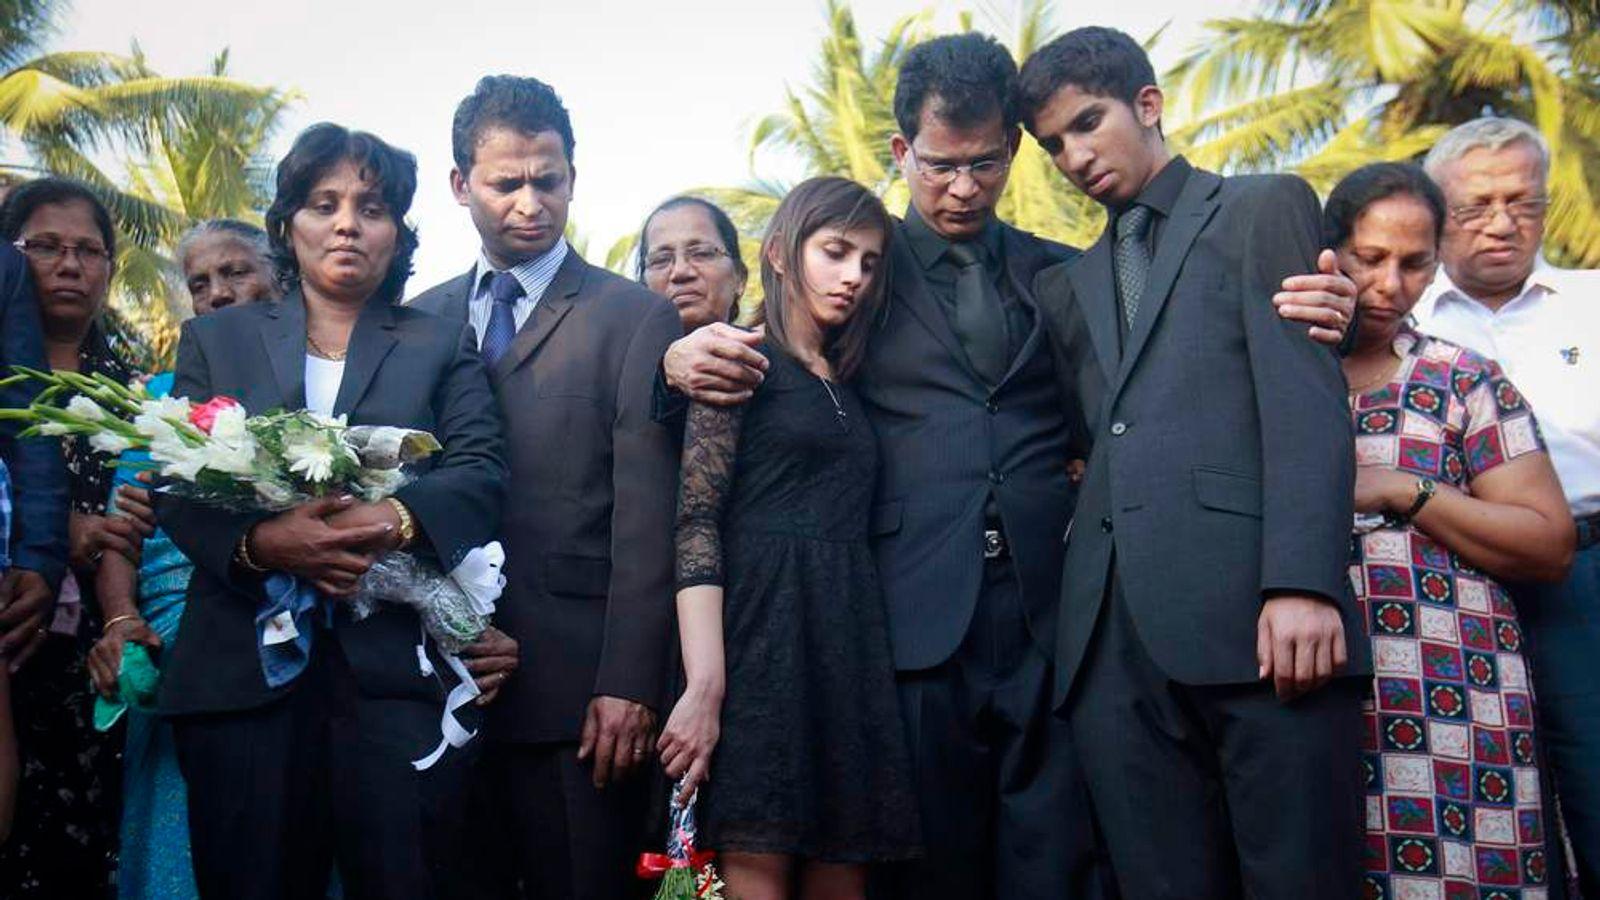 Jacintha Saldanha's widower Barboza and her children Lisha and Junal